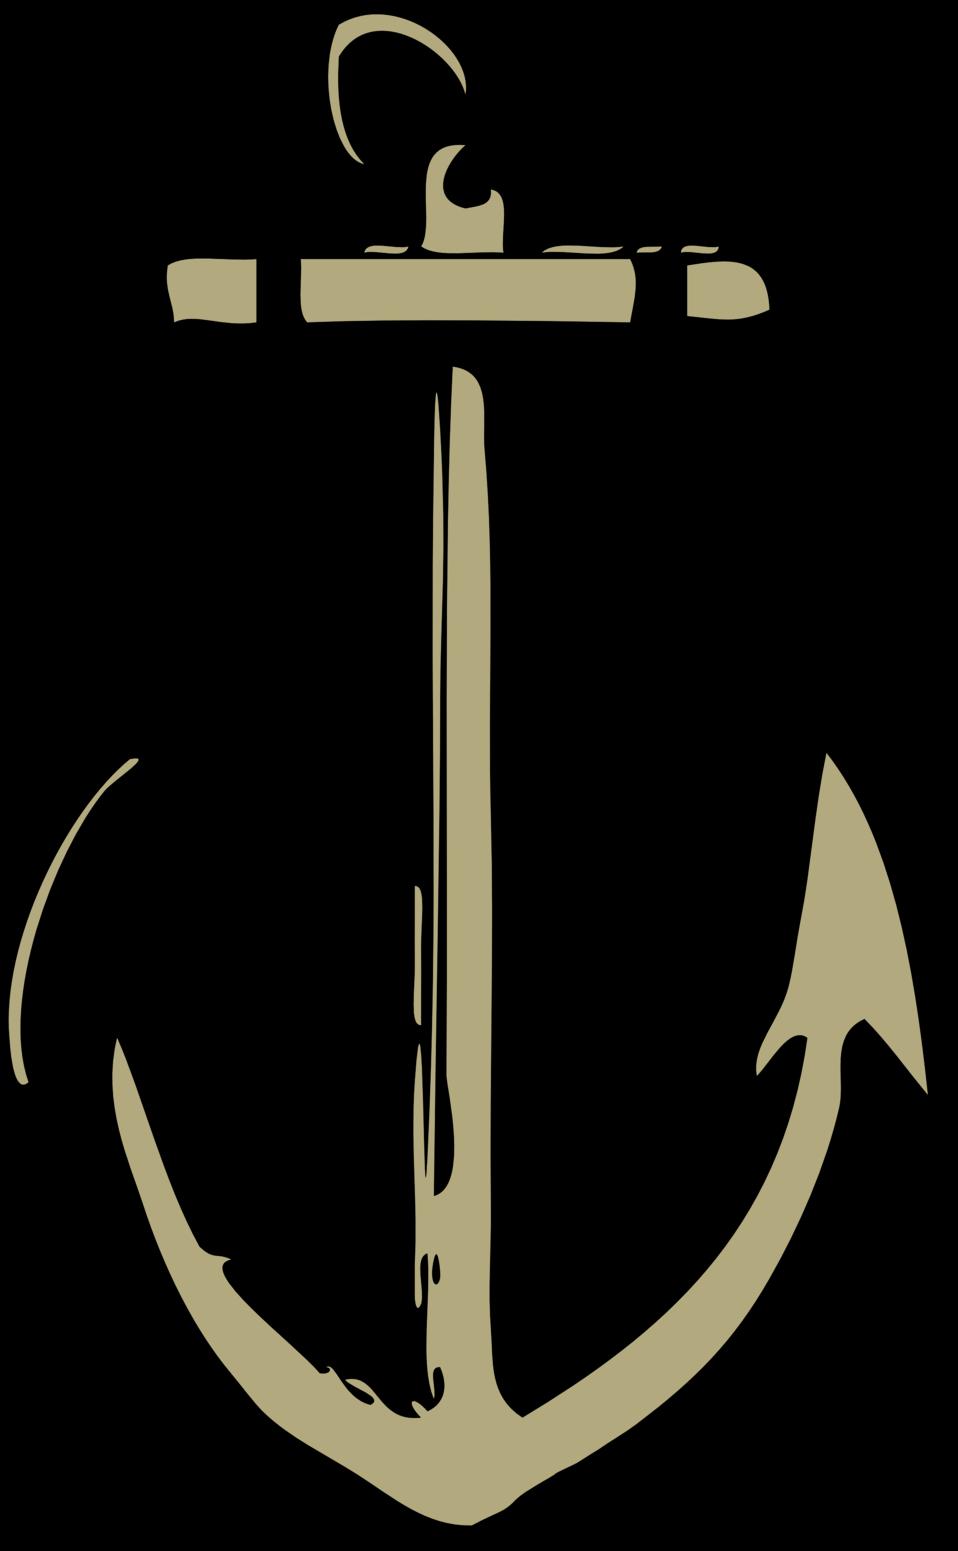 Clipart free anchor. Public domain clip art